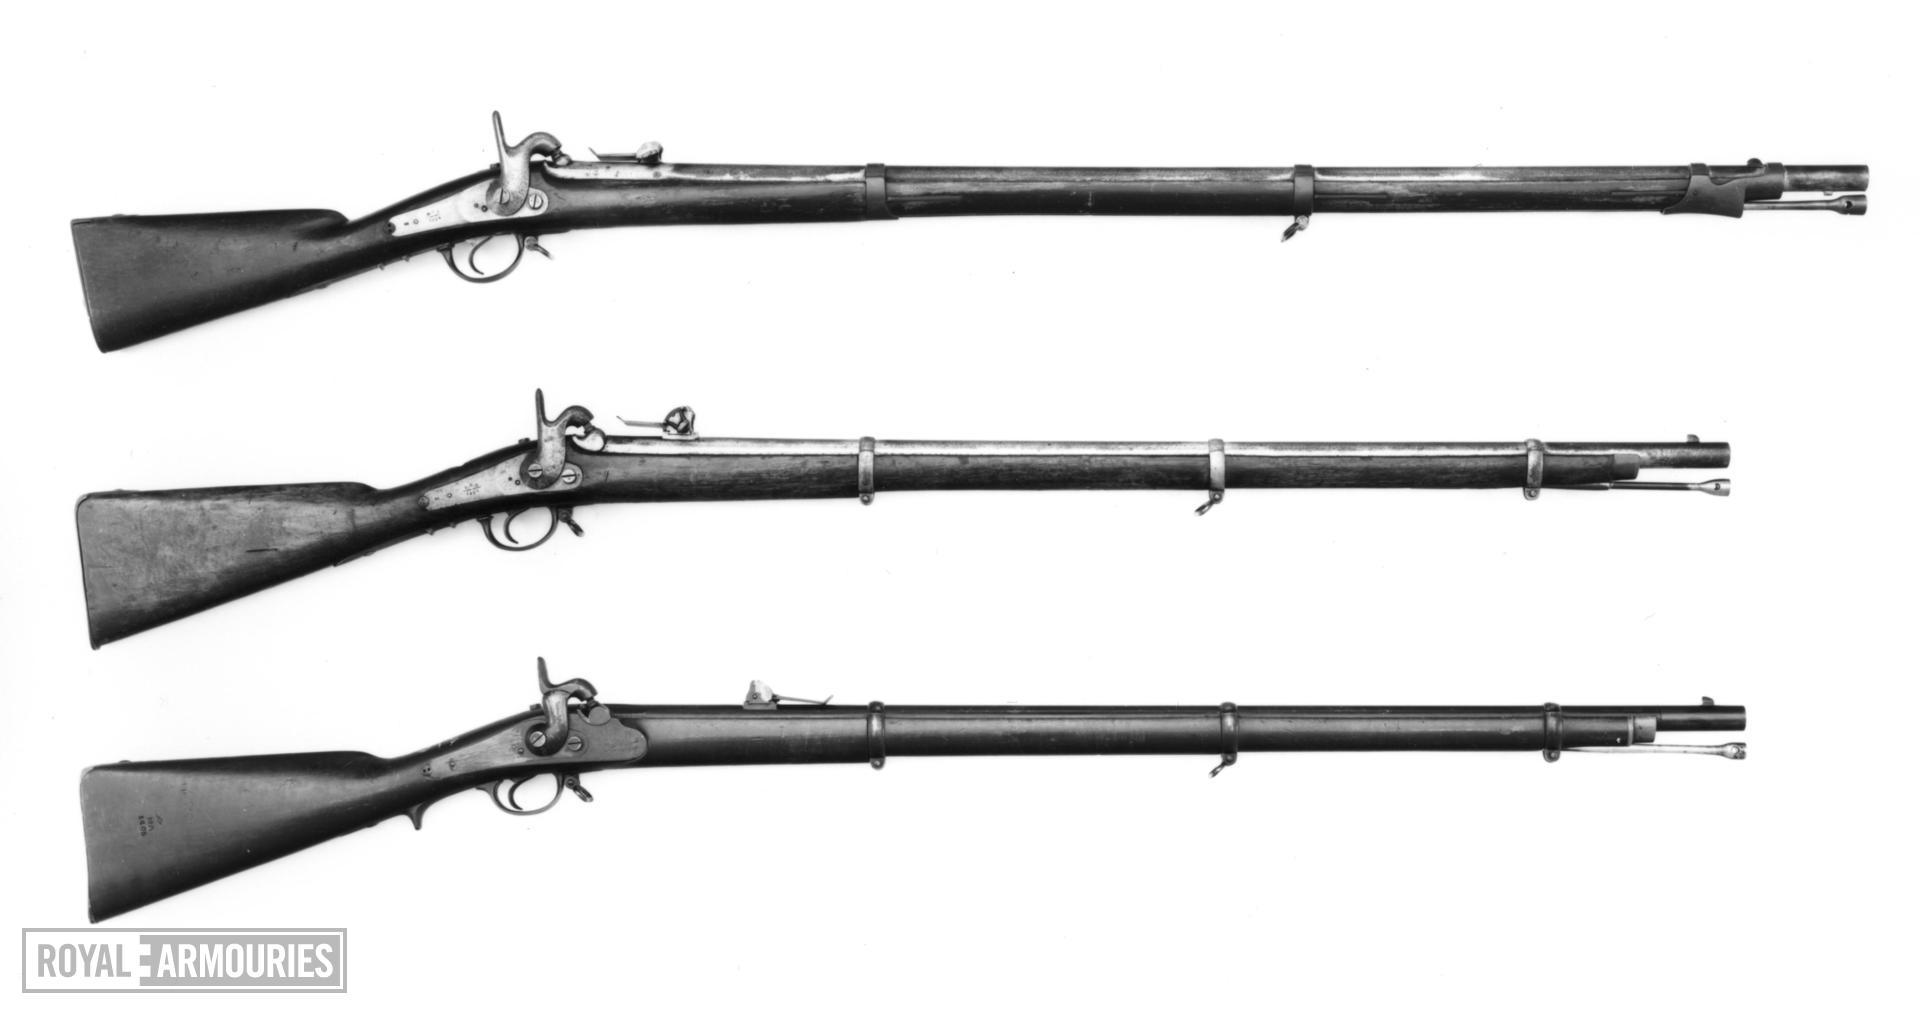 Percussion muzzle-loading military rifle - Model 1856